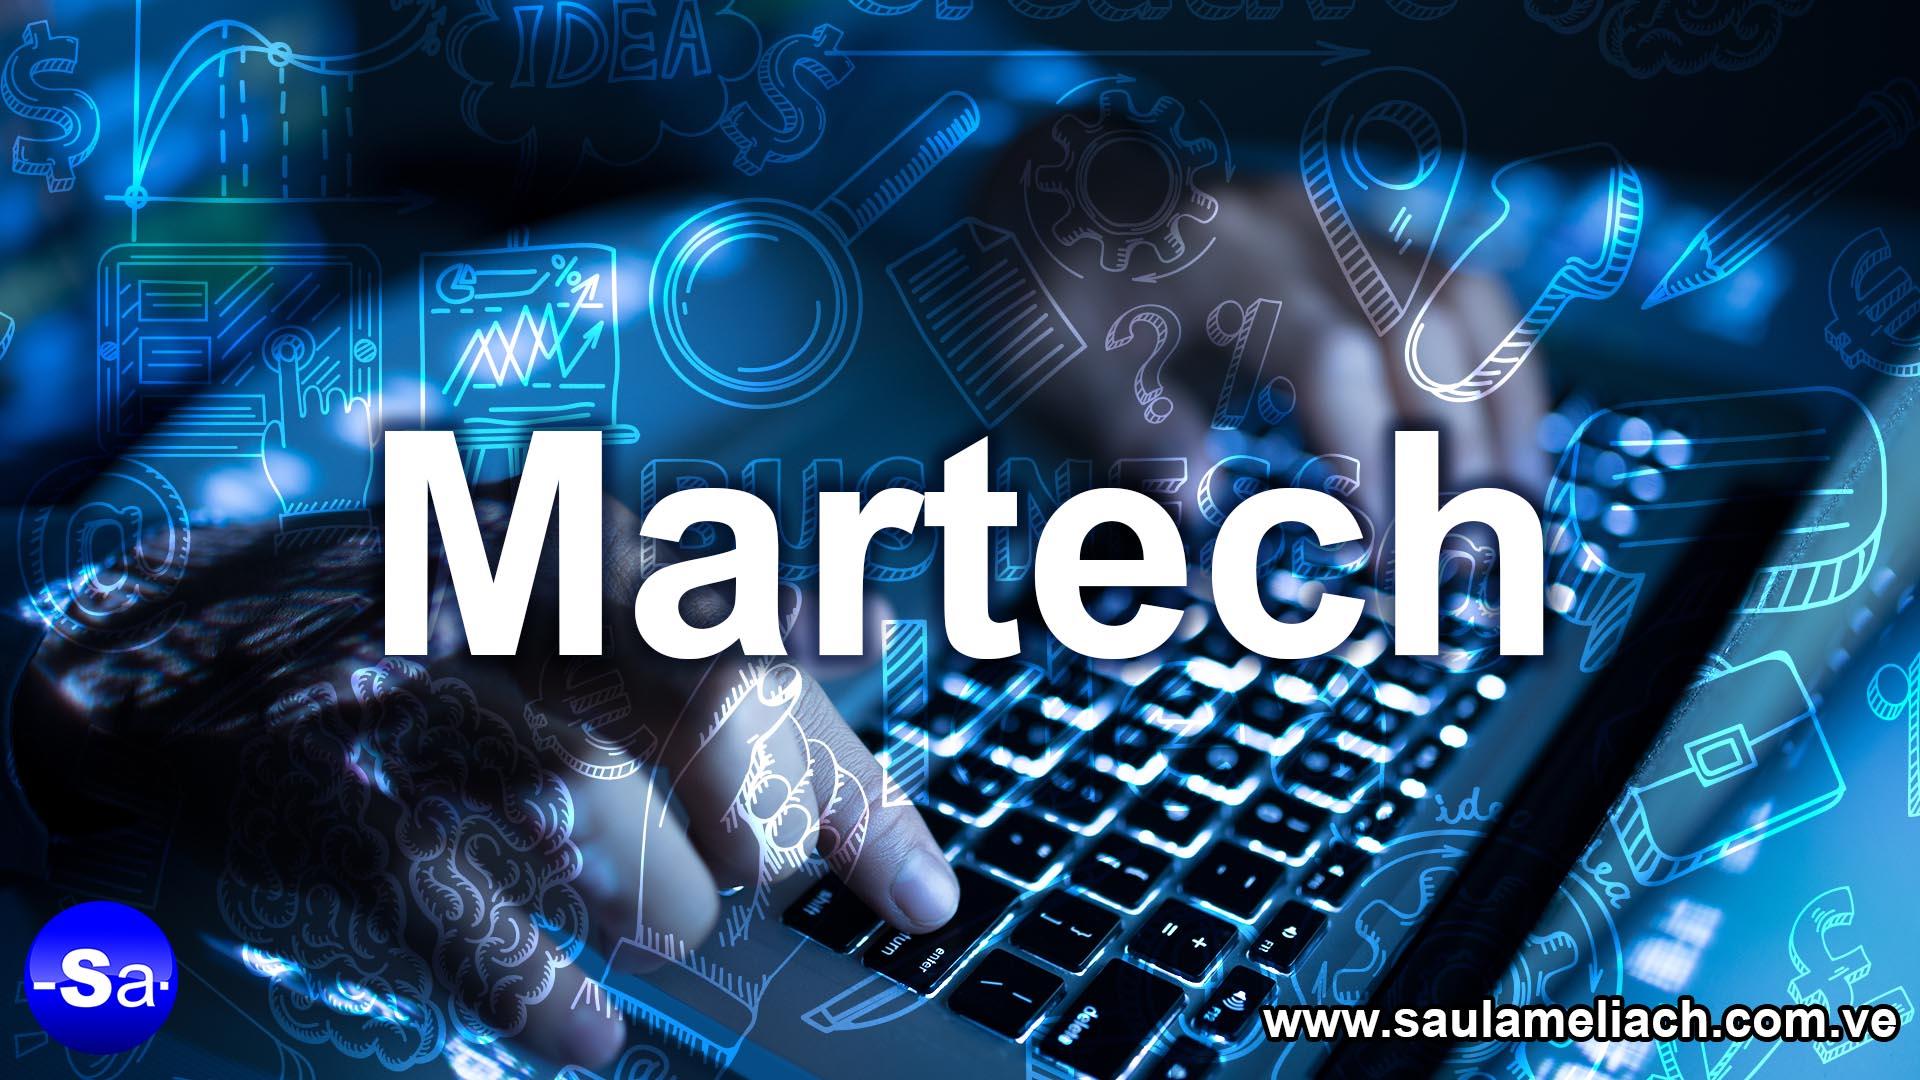 Martech - Saul ameliach